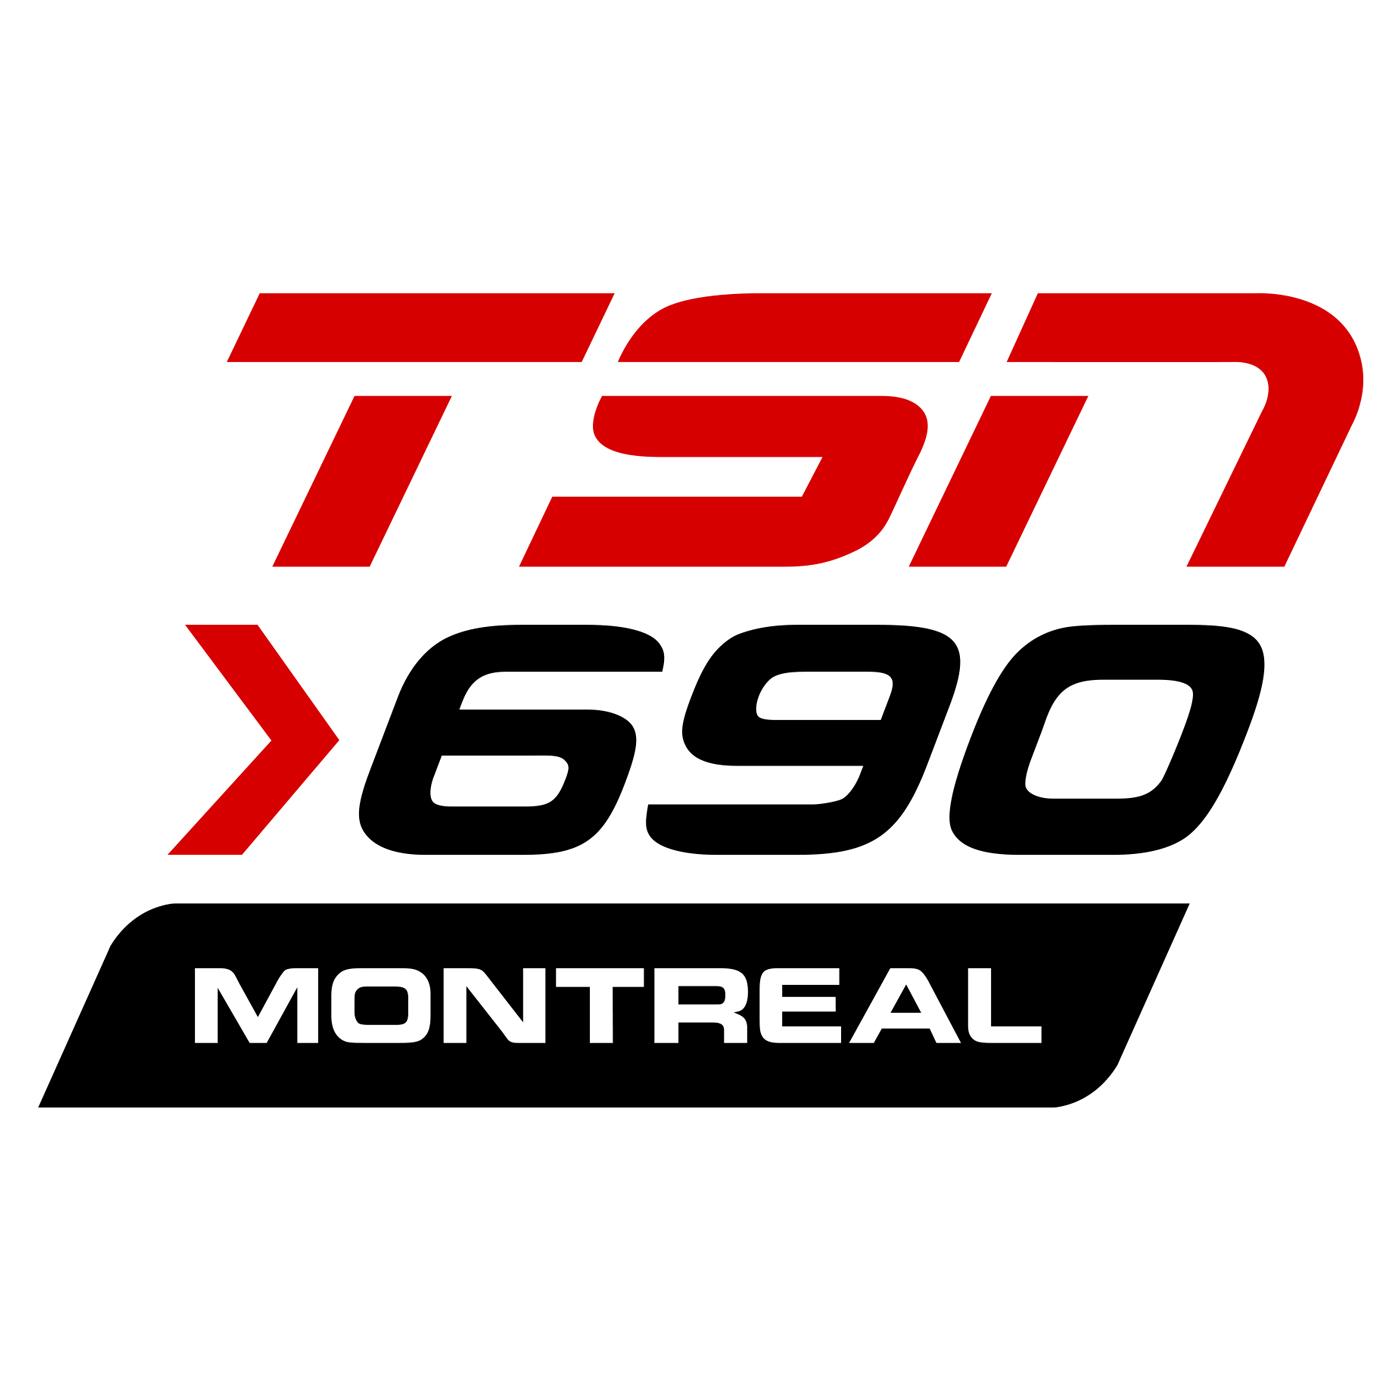 TSN 690 Montreal   News & Audio for all Montreal Sports